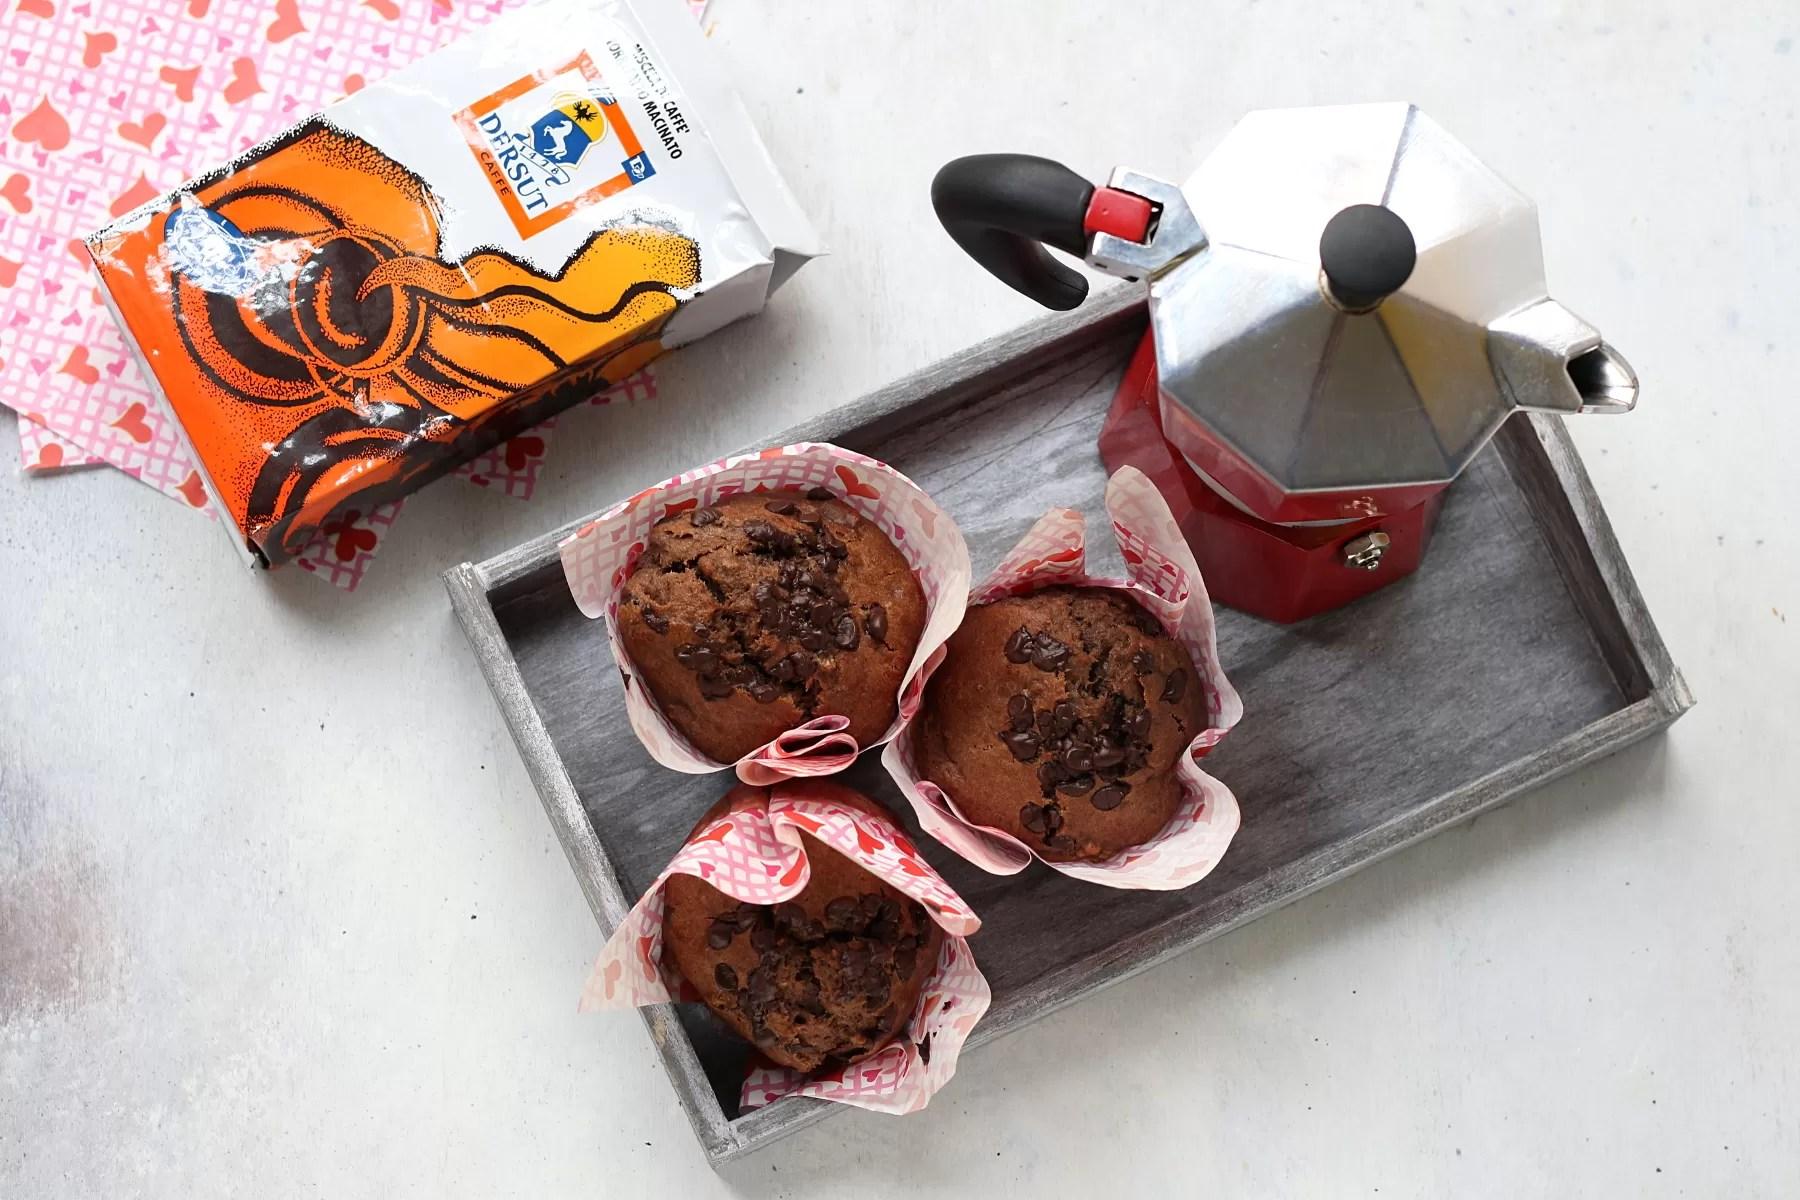 Muffin alla banana e caffè O.S. Dersut